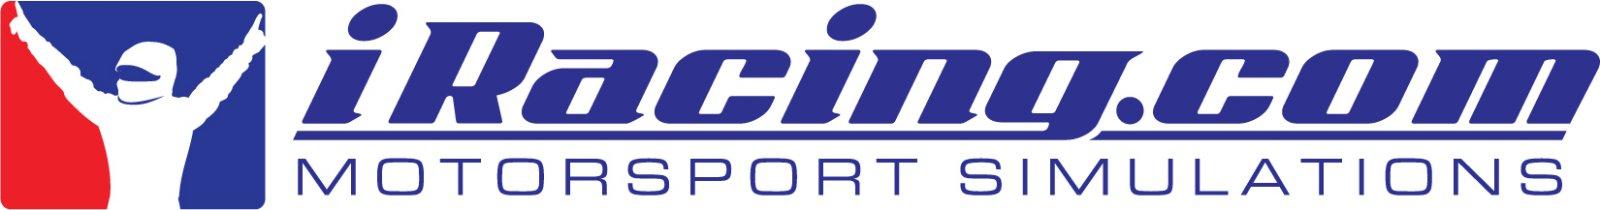 SRO Motorsports Group and iRacing.com announce Blancpain GT Sim Racing Series